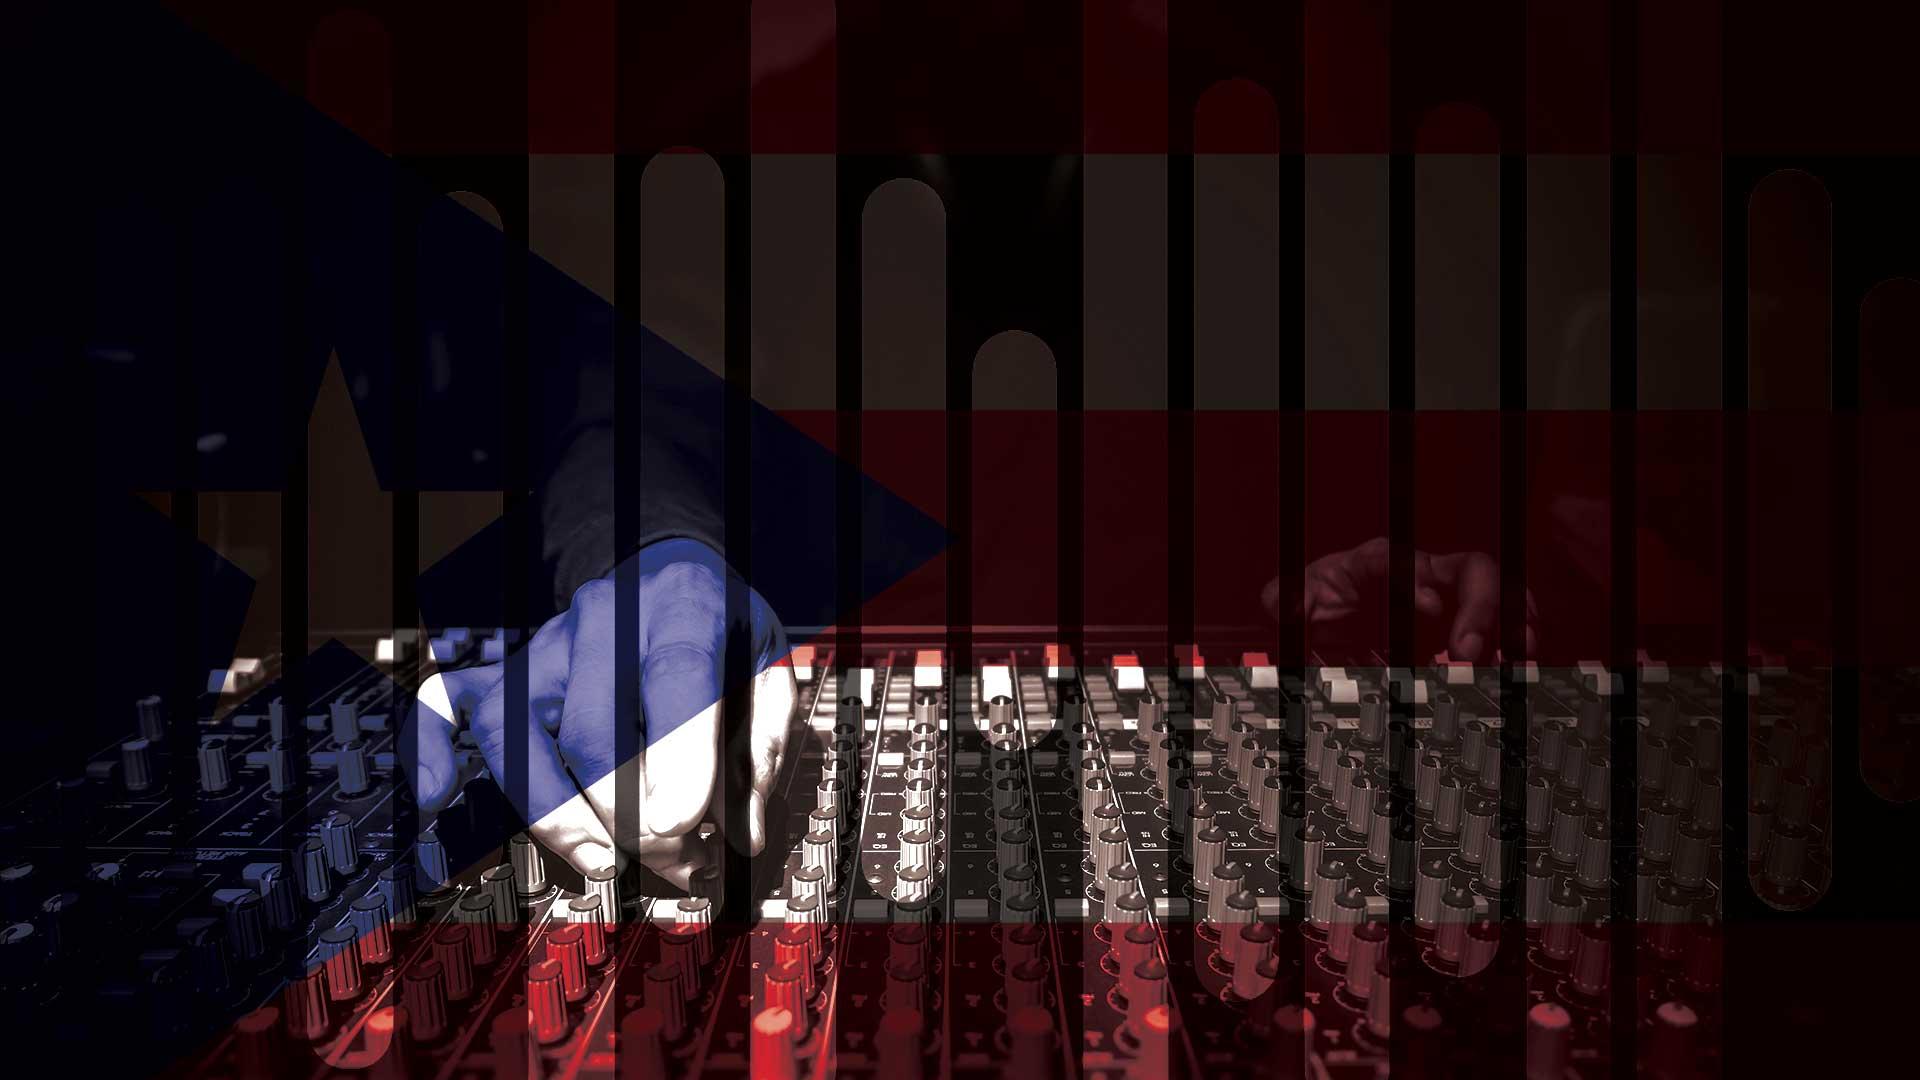 Voice-Over Services Puerto Rico - Voquent